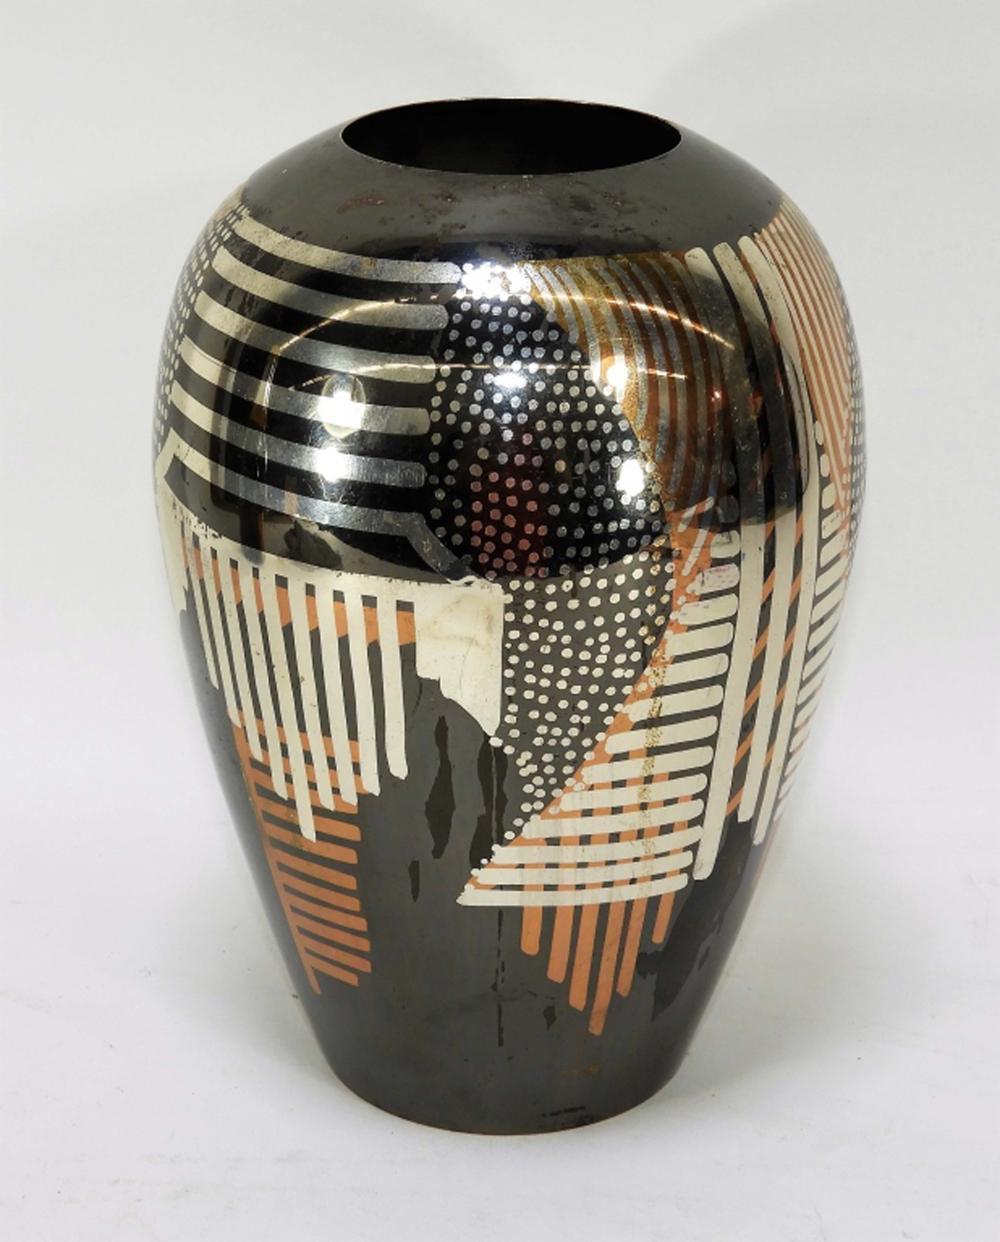 Rosenthal-Netter Modernist Patinated Metal Vase